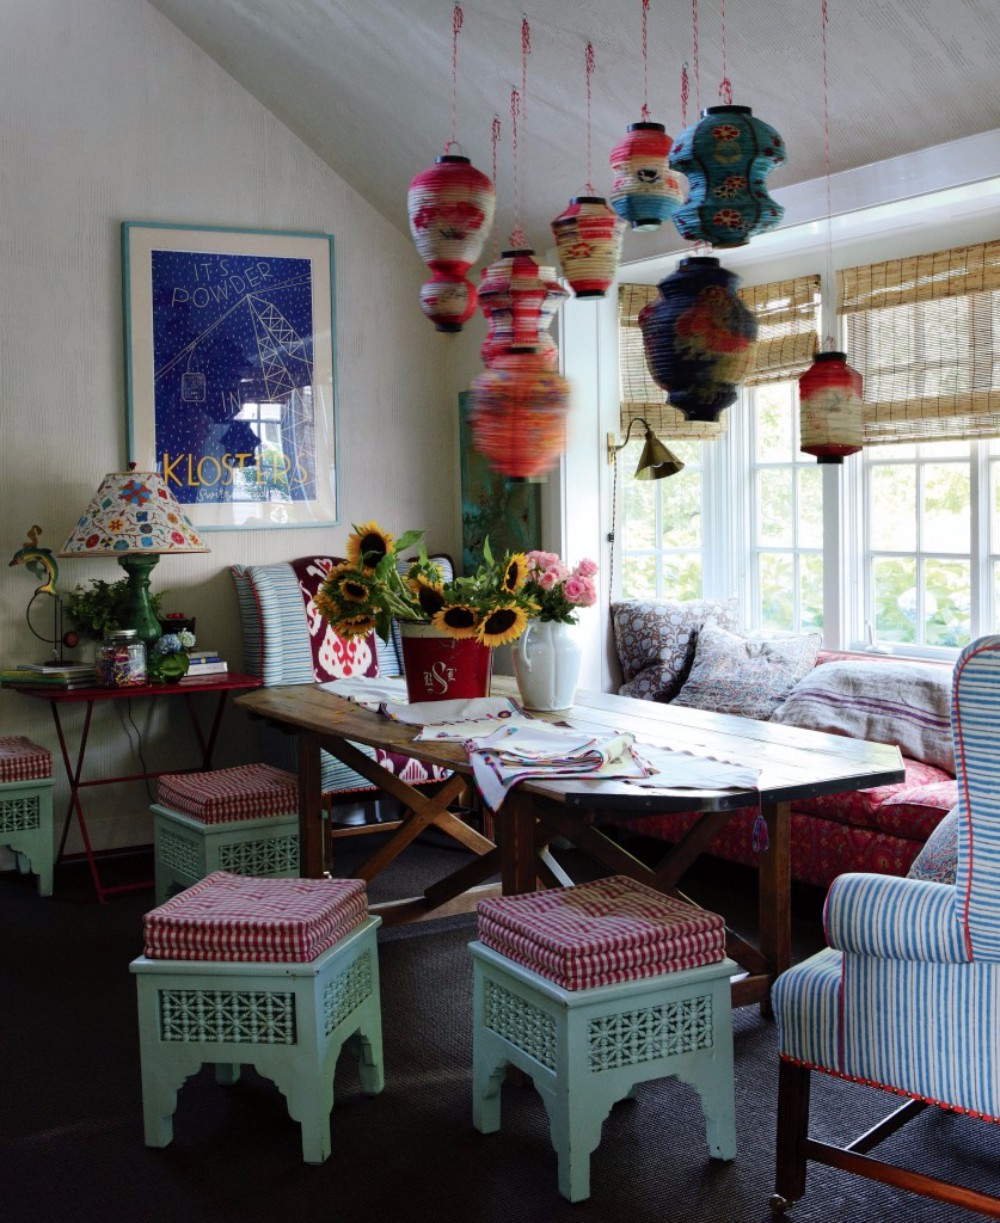 boho chic 25 Boho Chic Dining Room Designs That Will Inspire You 25 boho chic dining room designs that will inspire you 20